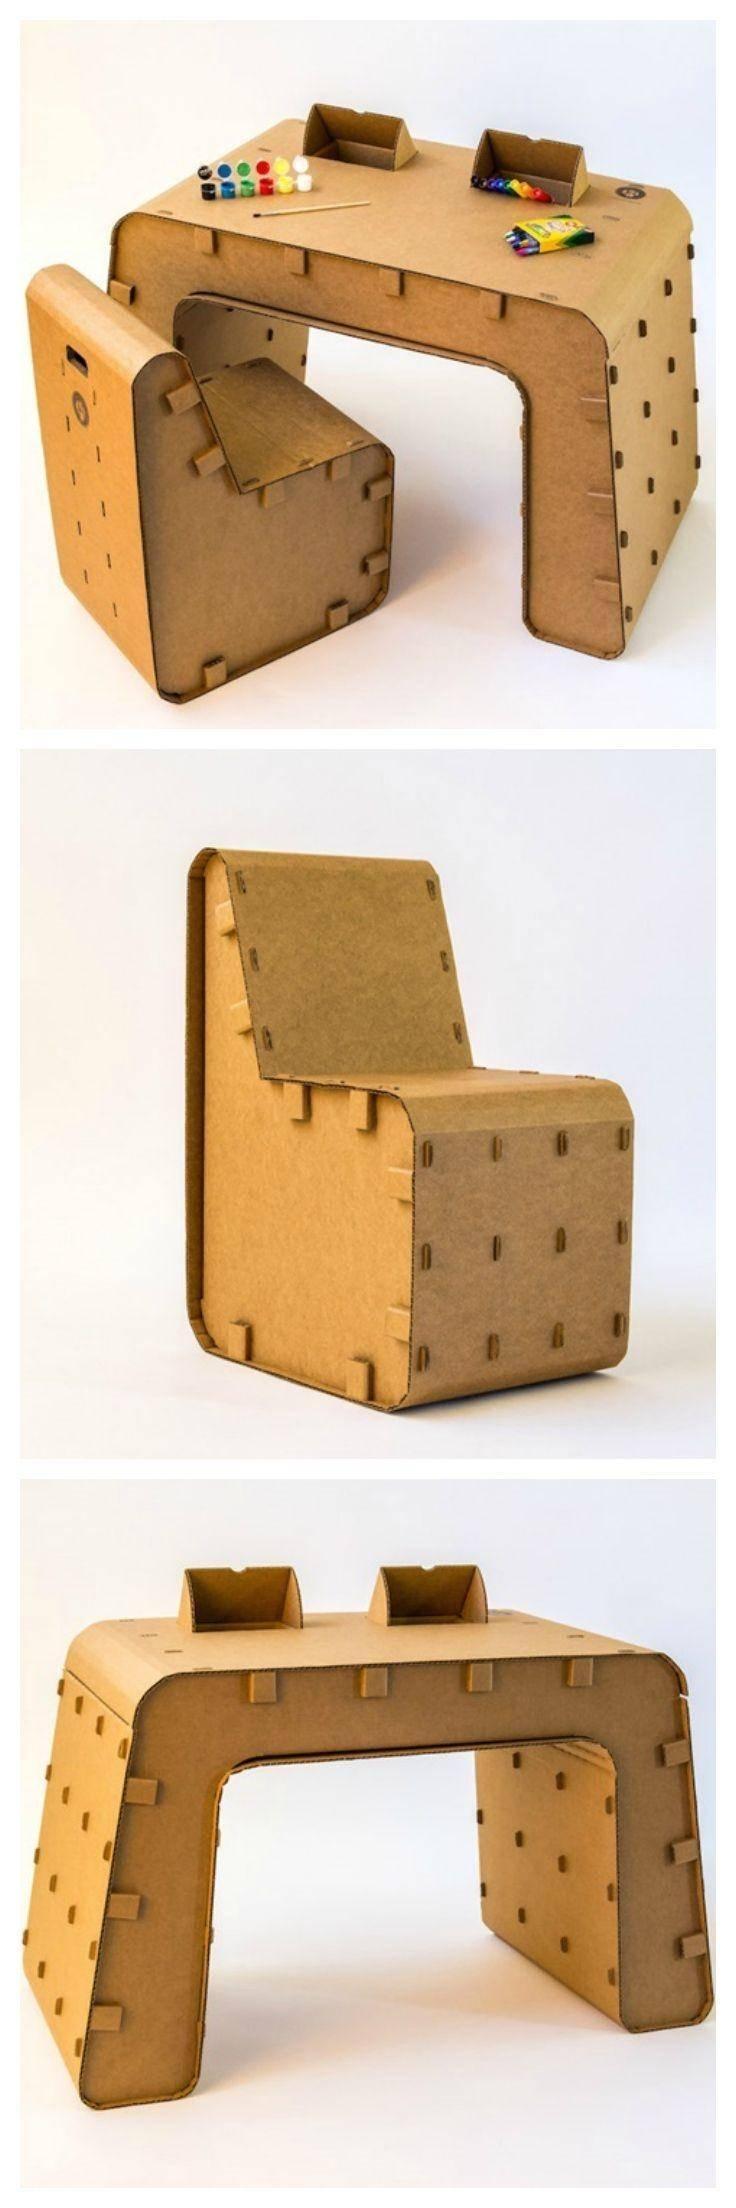 cardboard sofa | Centerfieldbar.com